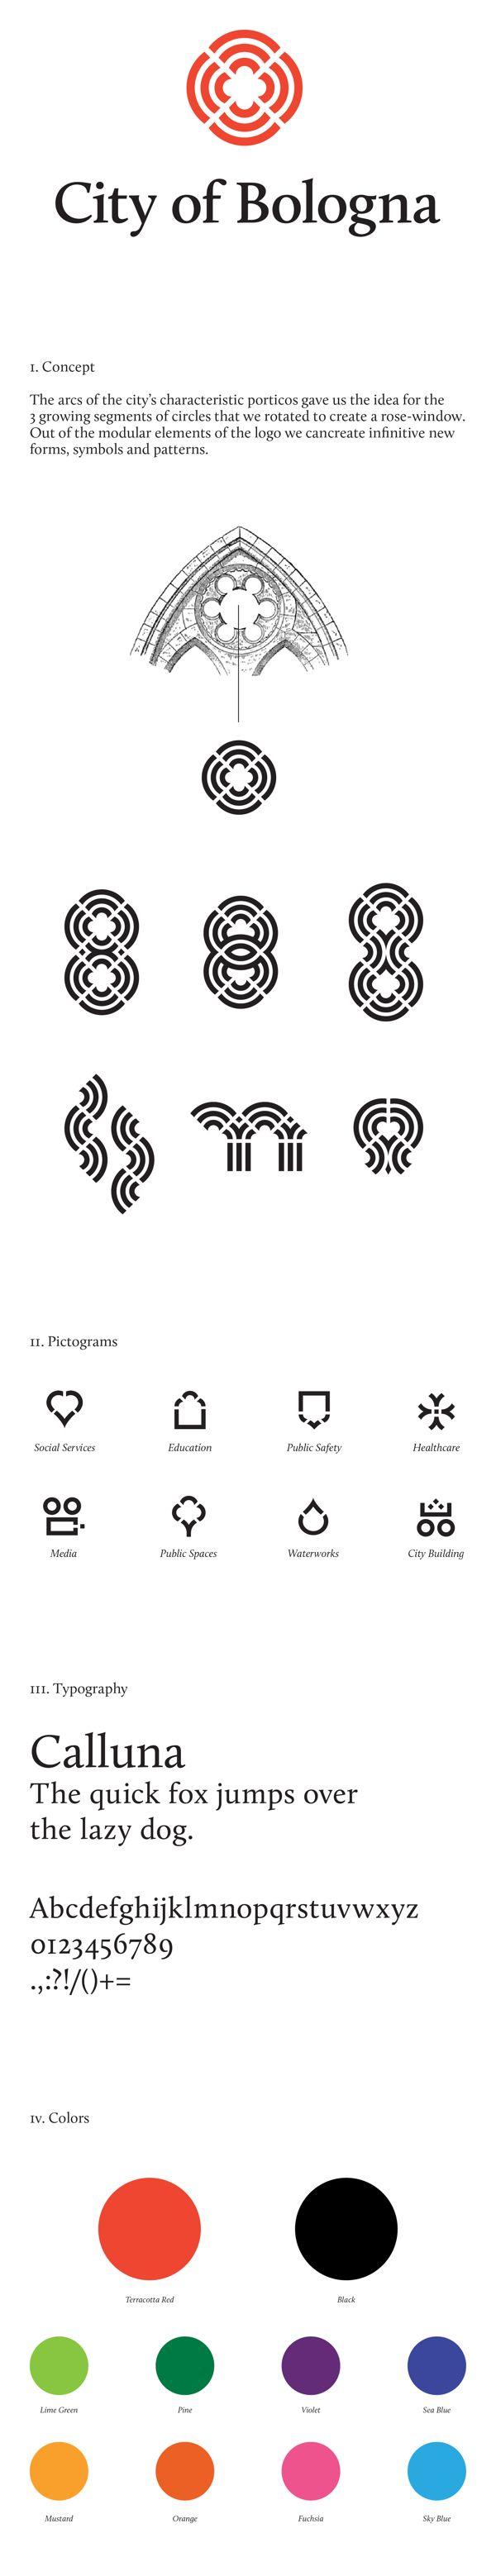 City of Bologna / Rebranding Proposal / Lili Köves